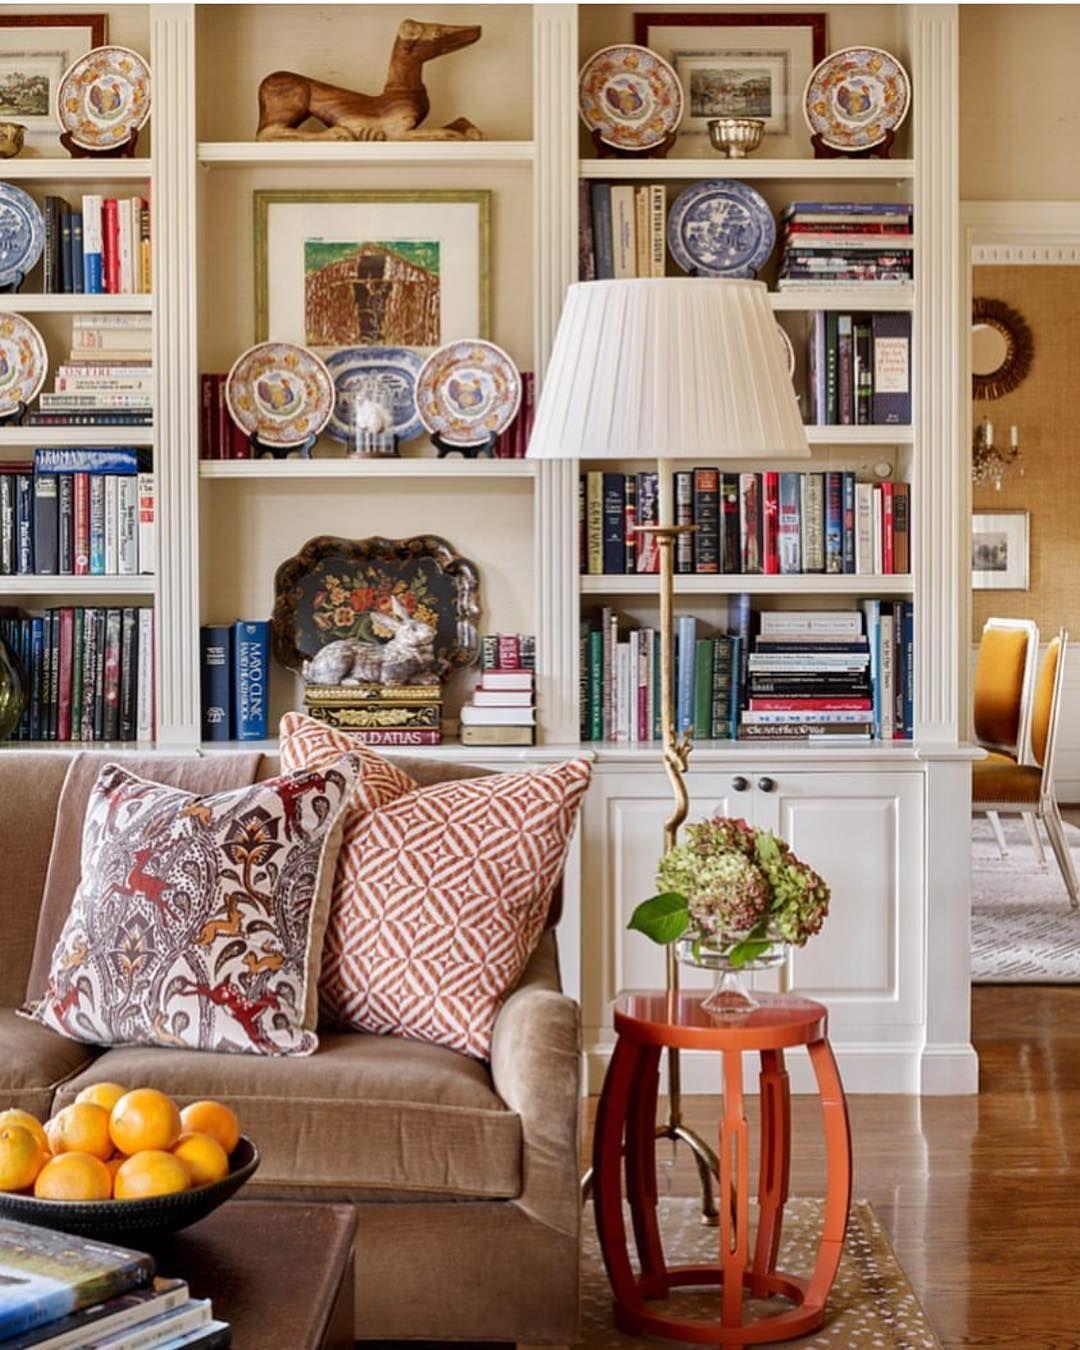 Roman And Ivy On Instagram A Room With Books Just Feels So Good Via Jamestfarmer Homeinspo Houseportrait Interio Living Decor Interior Interior Design